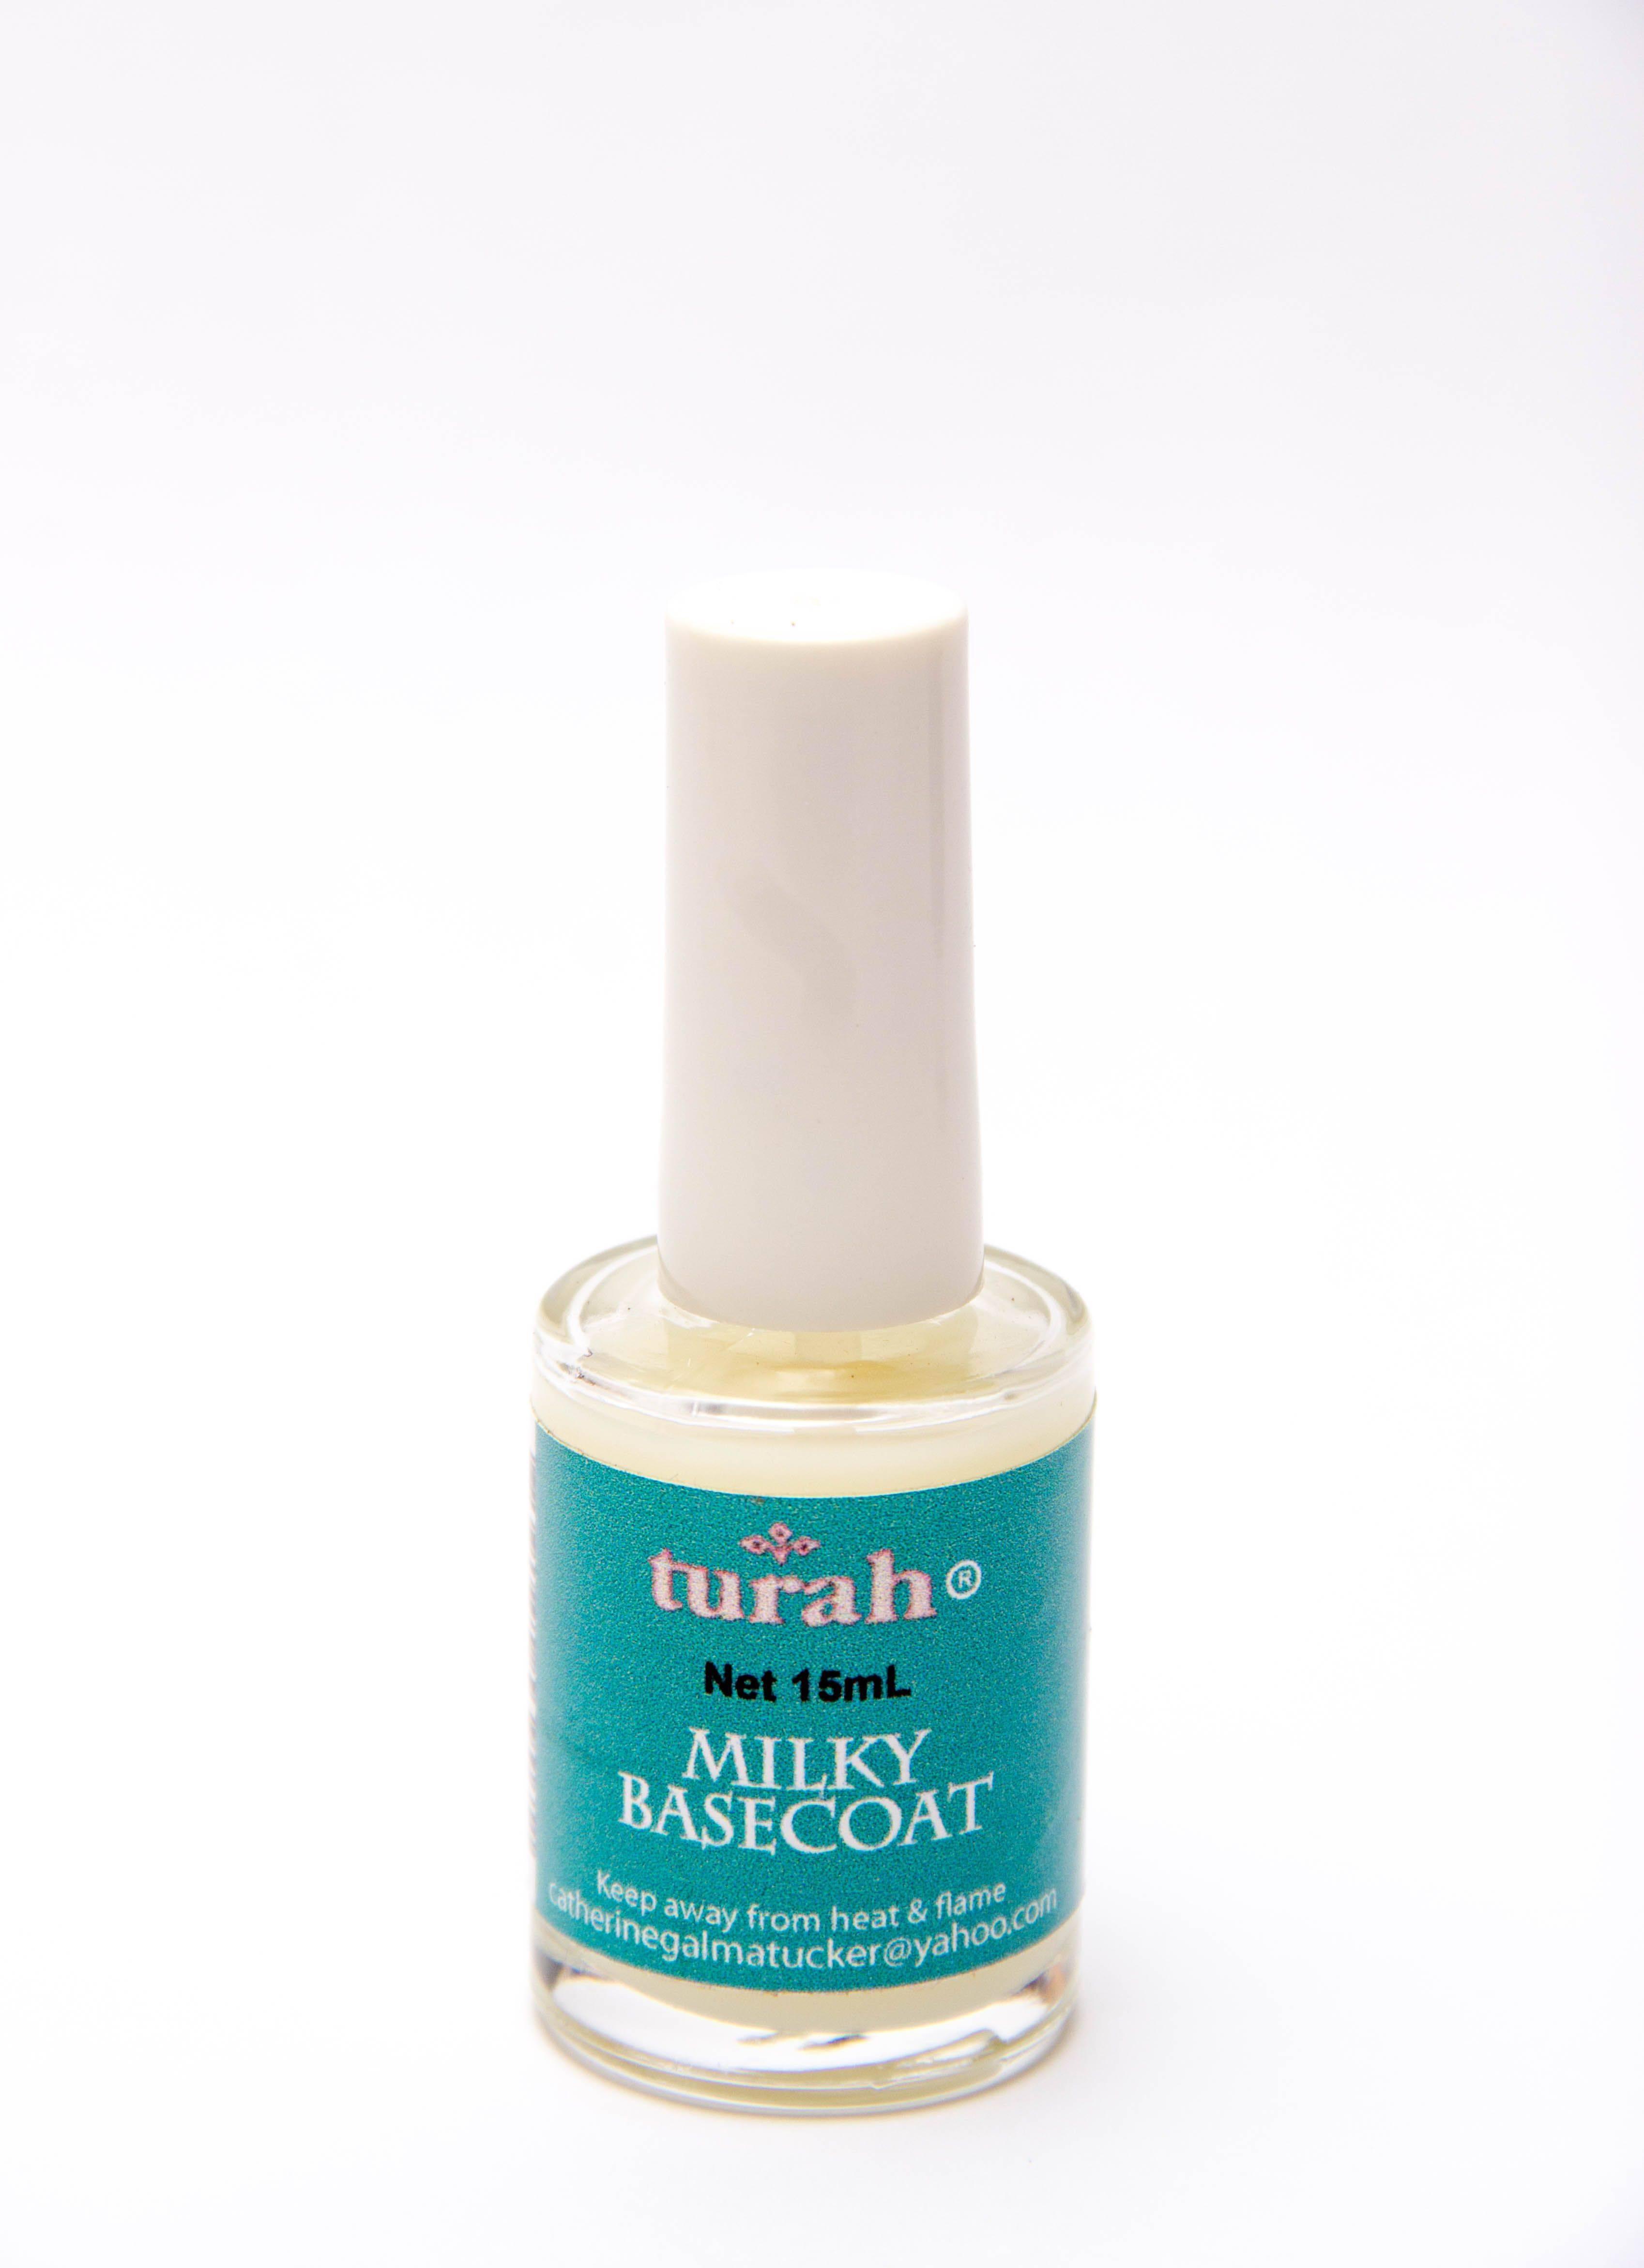 Turah Milky BaseCoat